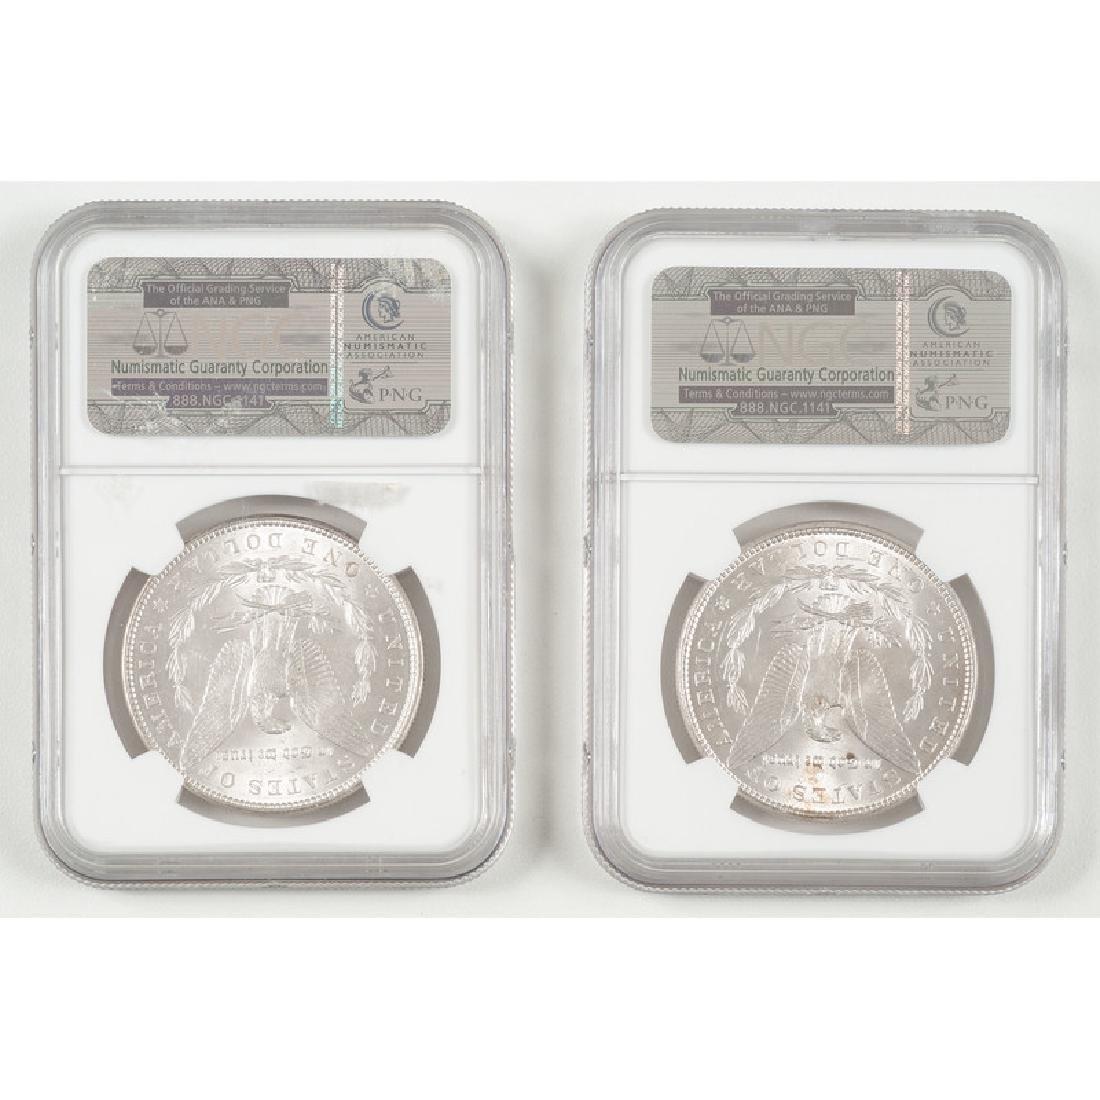 United States Morgan Silver Dollars 1888 NGC MS62, 1889 - 2